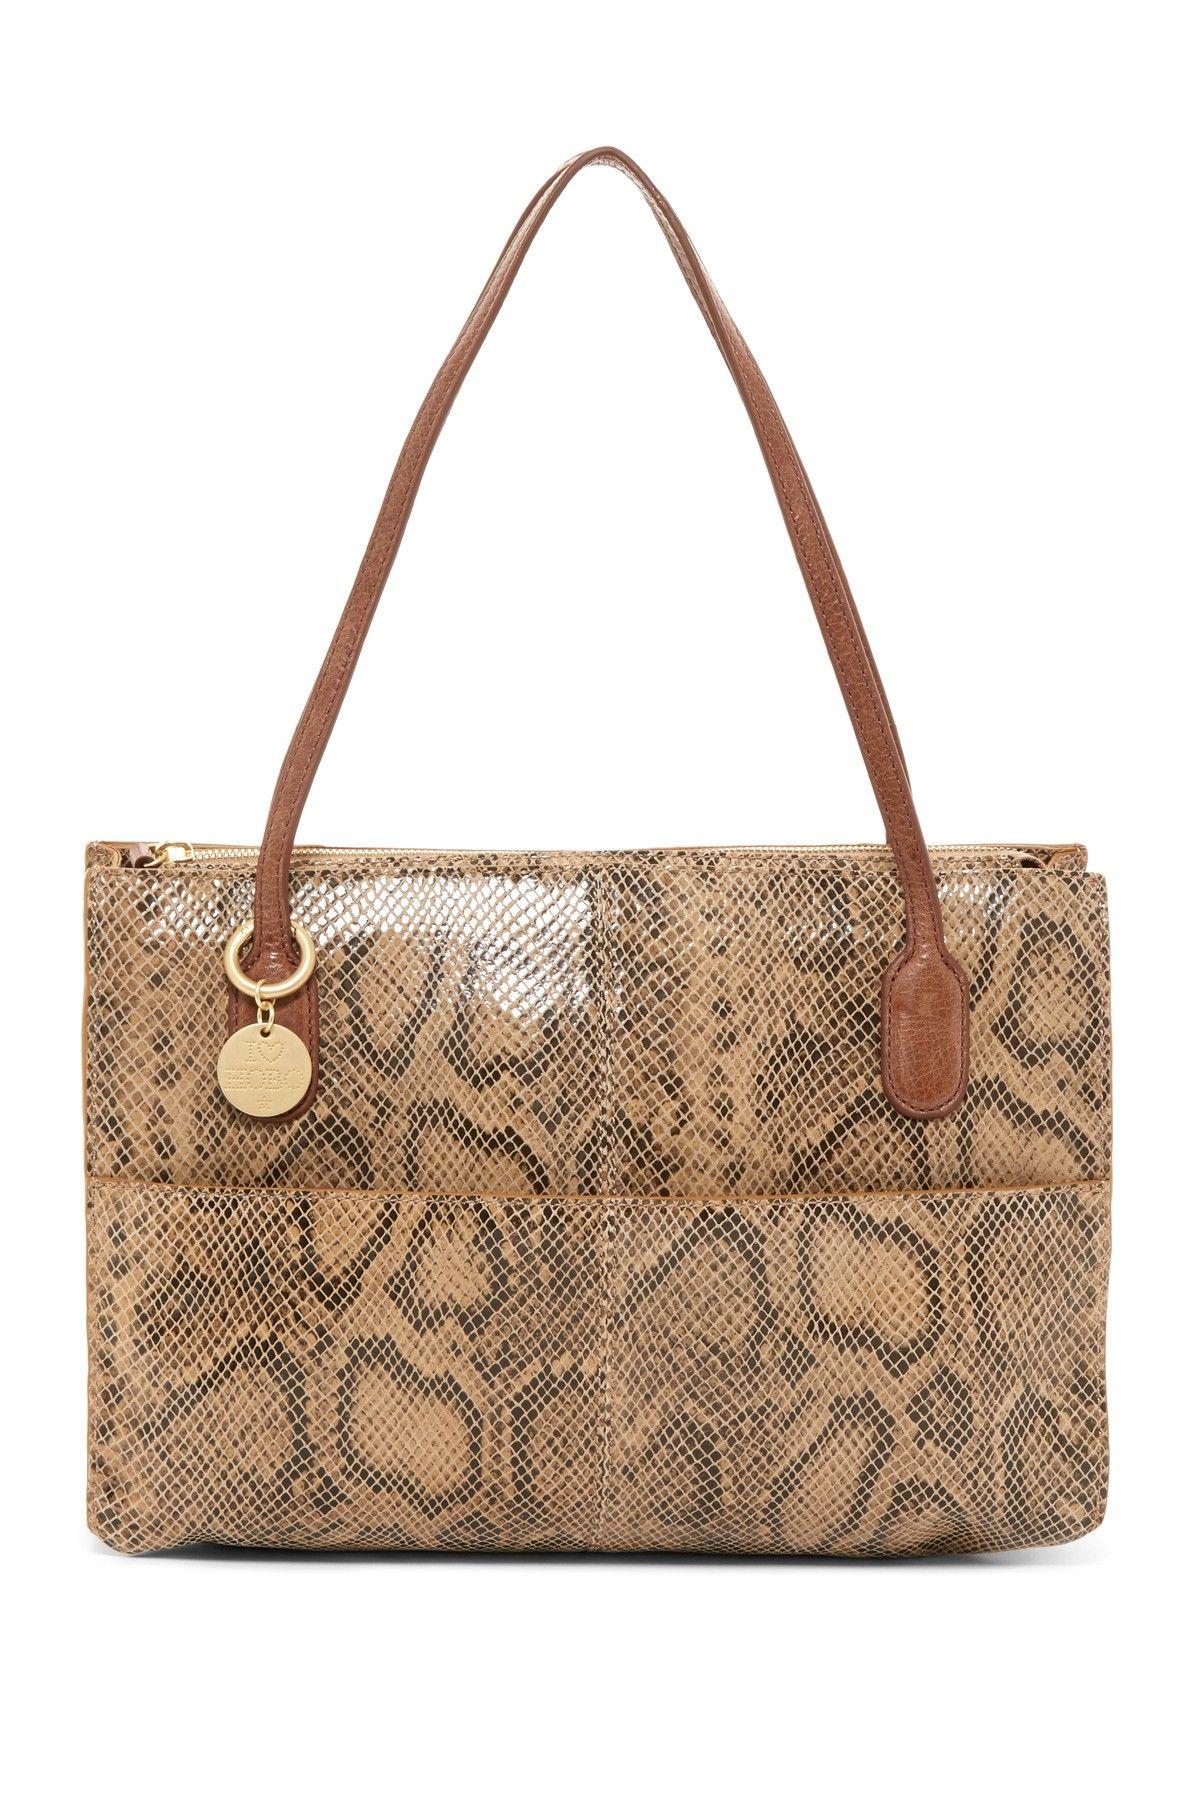 cb3b4b01c4ac Fashion Bag Image Collection